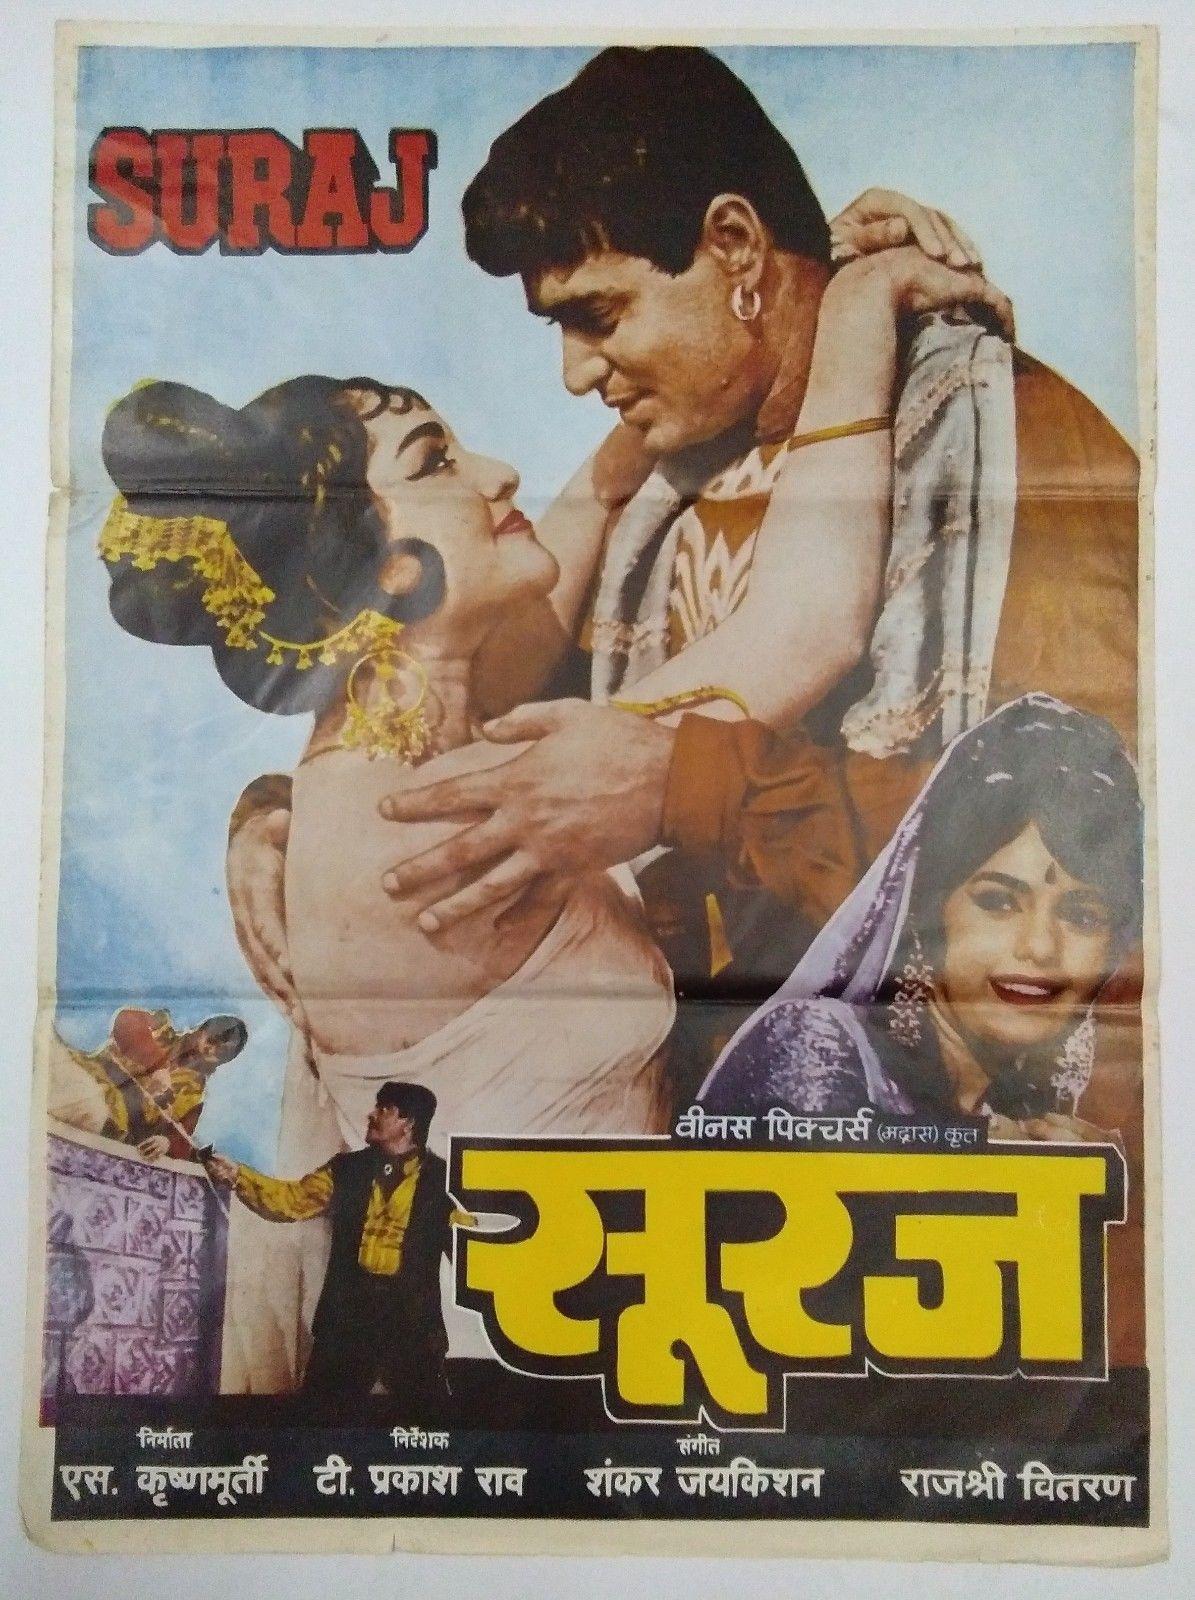 Indian Vintage Old Bollywood Movie Poster Suraj Rajendra Kumar Mumtaz Entertainment Memorabilia Mo Bollywood Posters Old Bollywood Movies Old Movie Posters